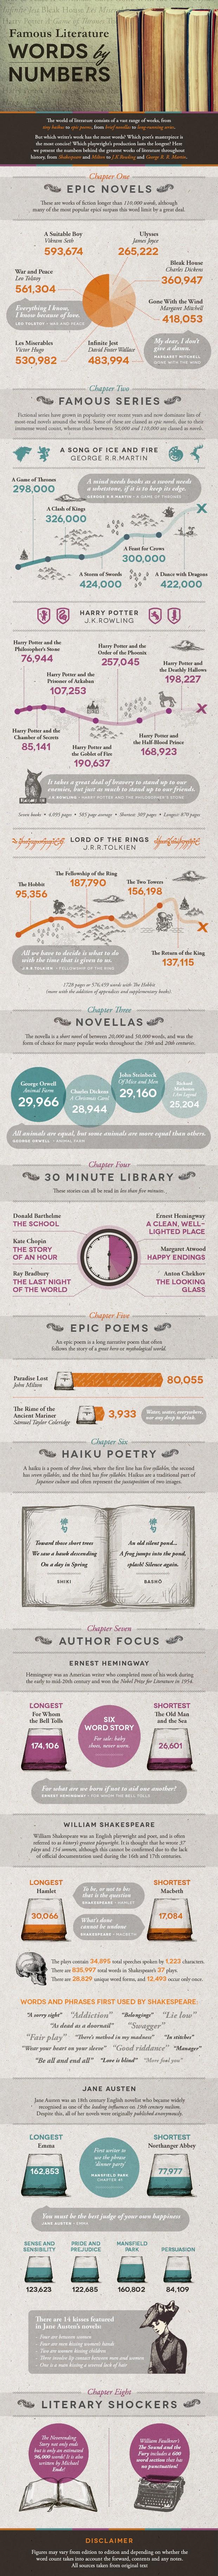 word counts of novels